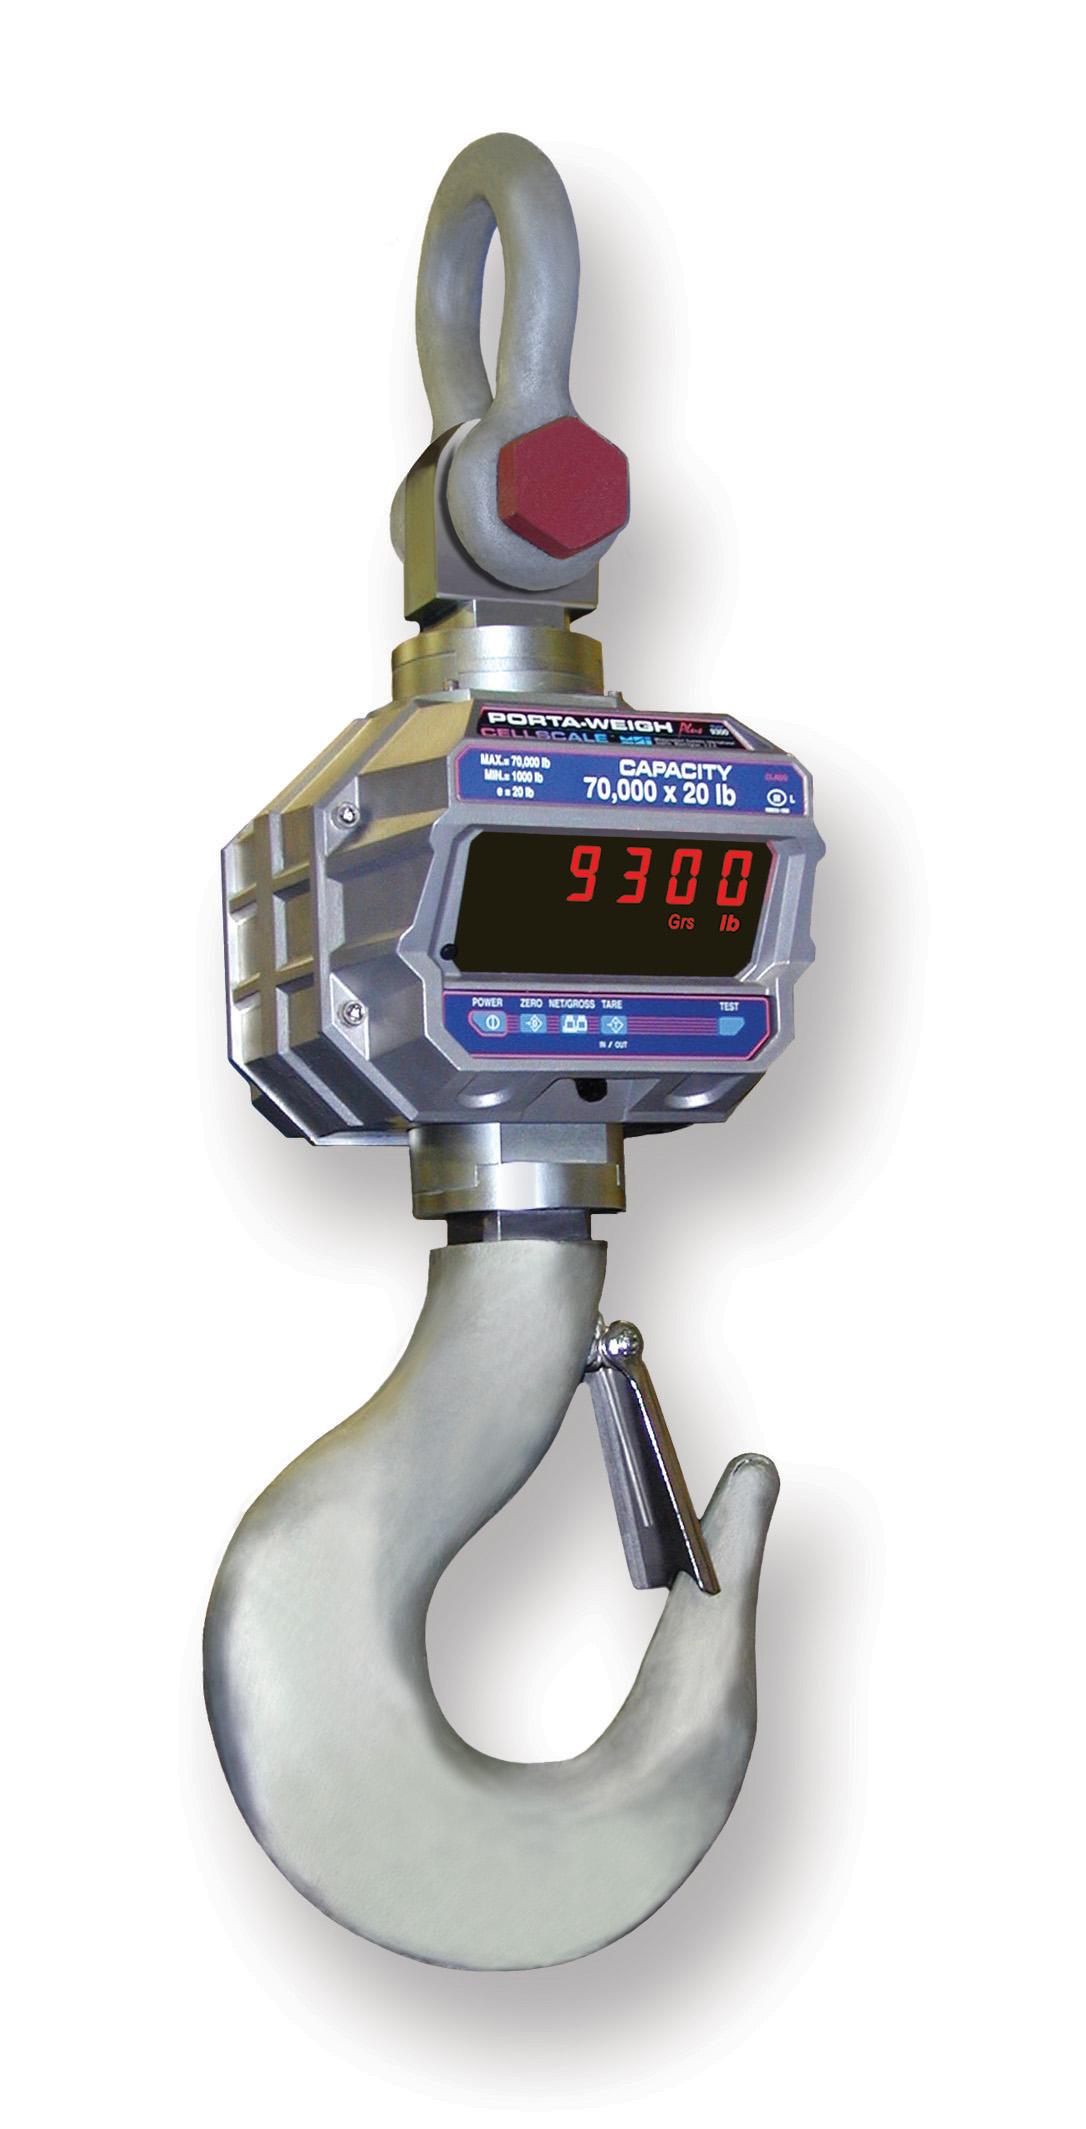 MSI 9300HT Hi-Torque Port-A-Weigh Plus CellScale Image